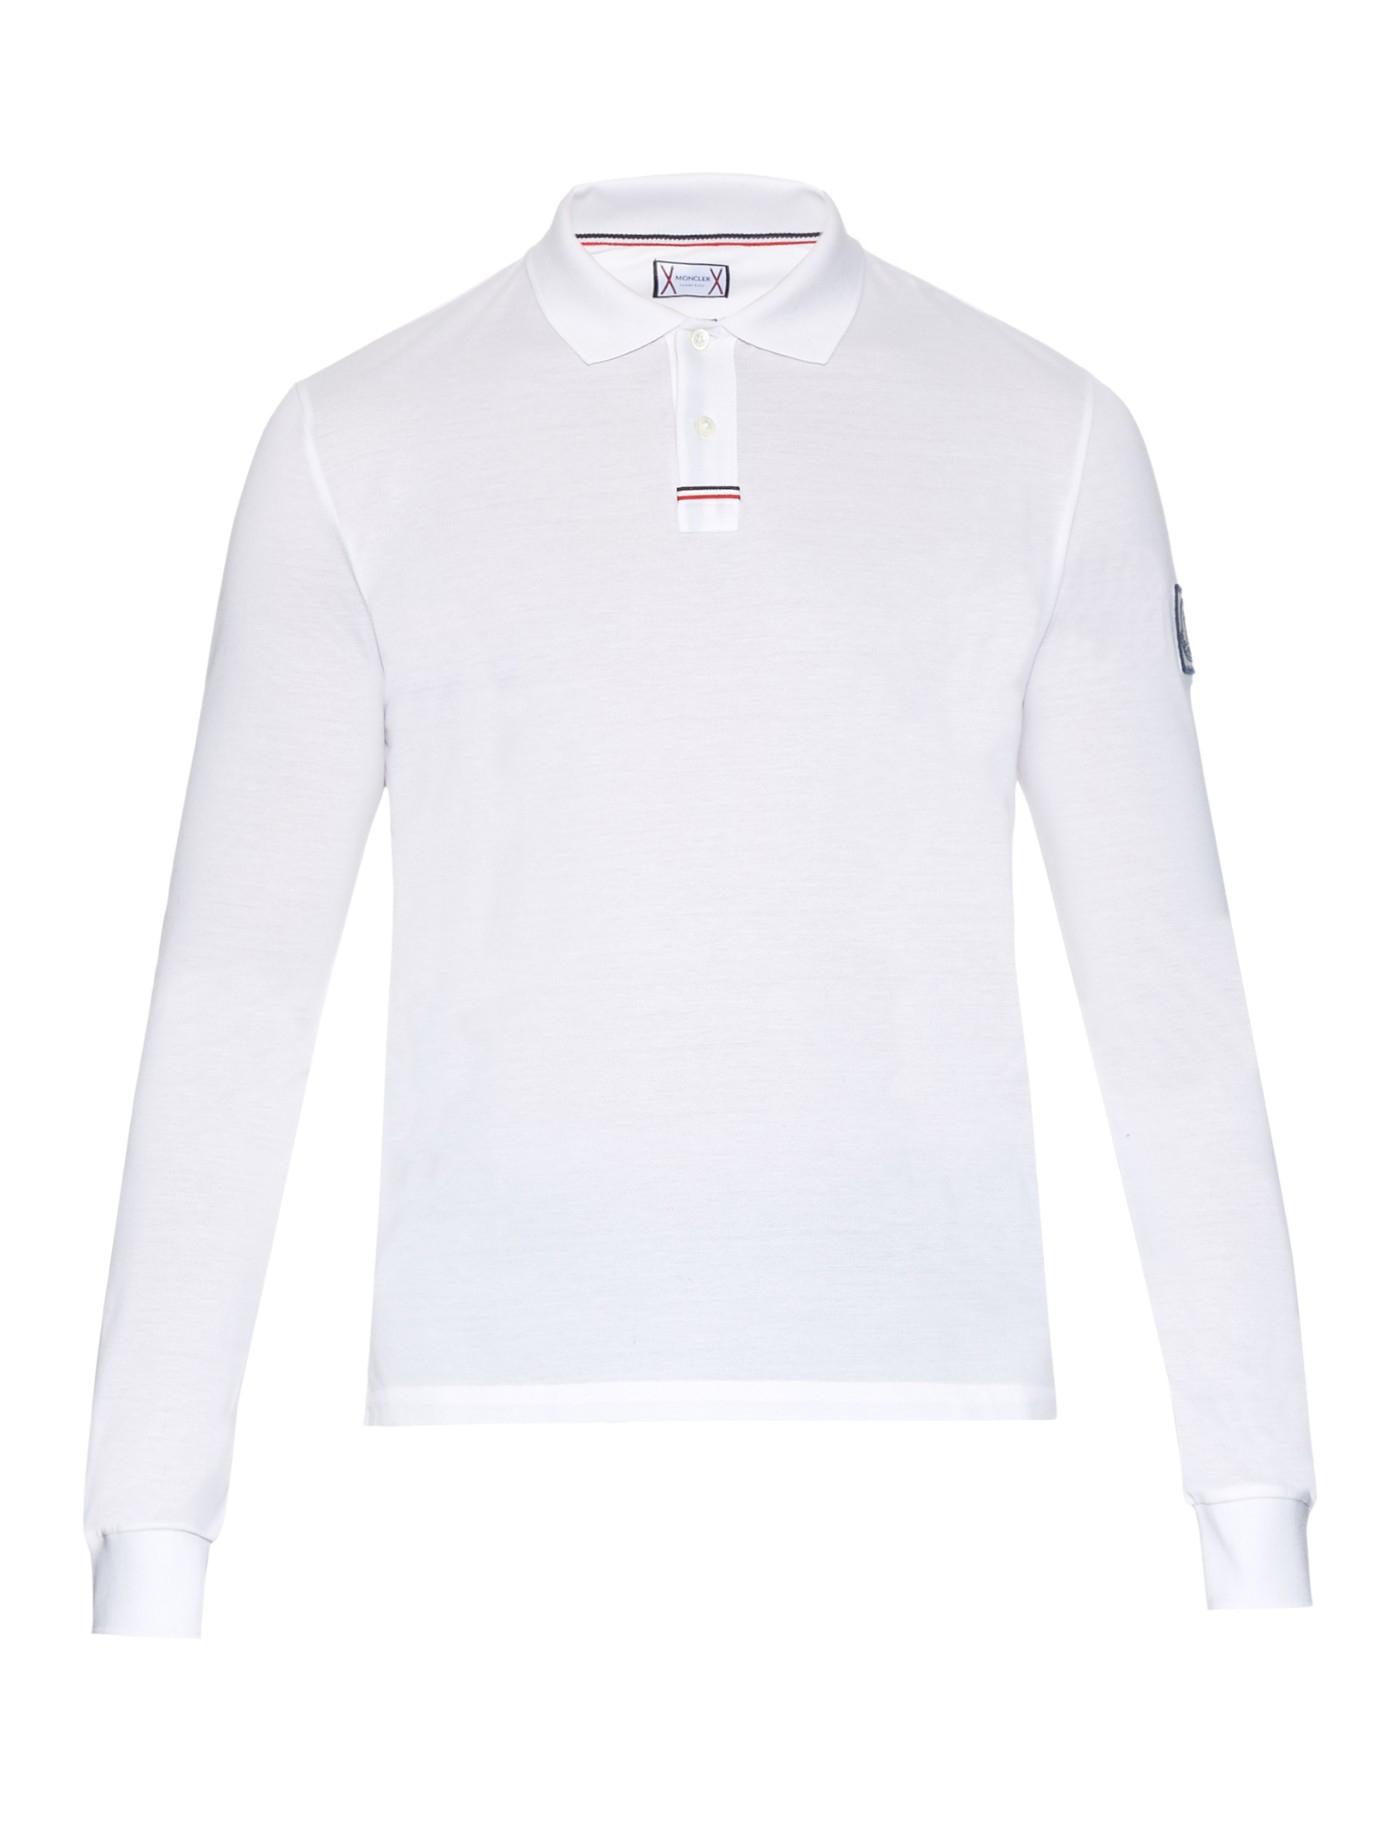 a0663bb4ad97 Lyst - Moncler Gamme Bleu Long-sleeved Cotton Piqué Polo Shirt in ...